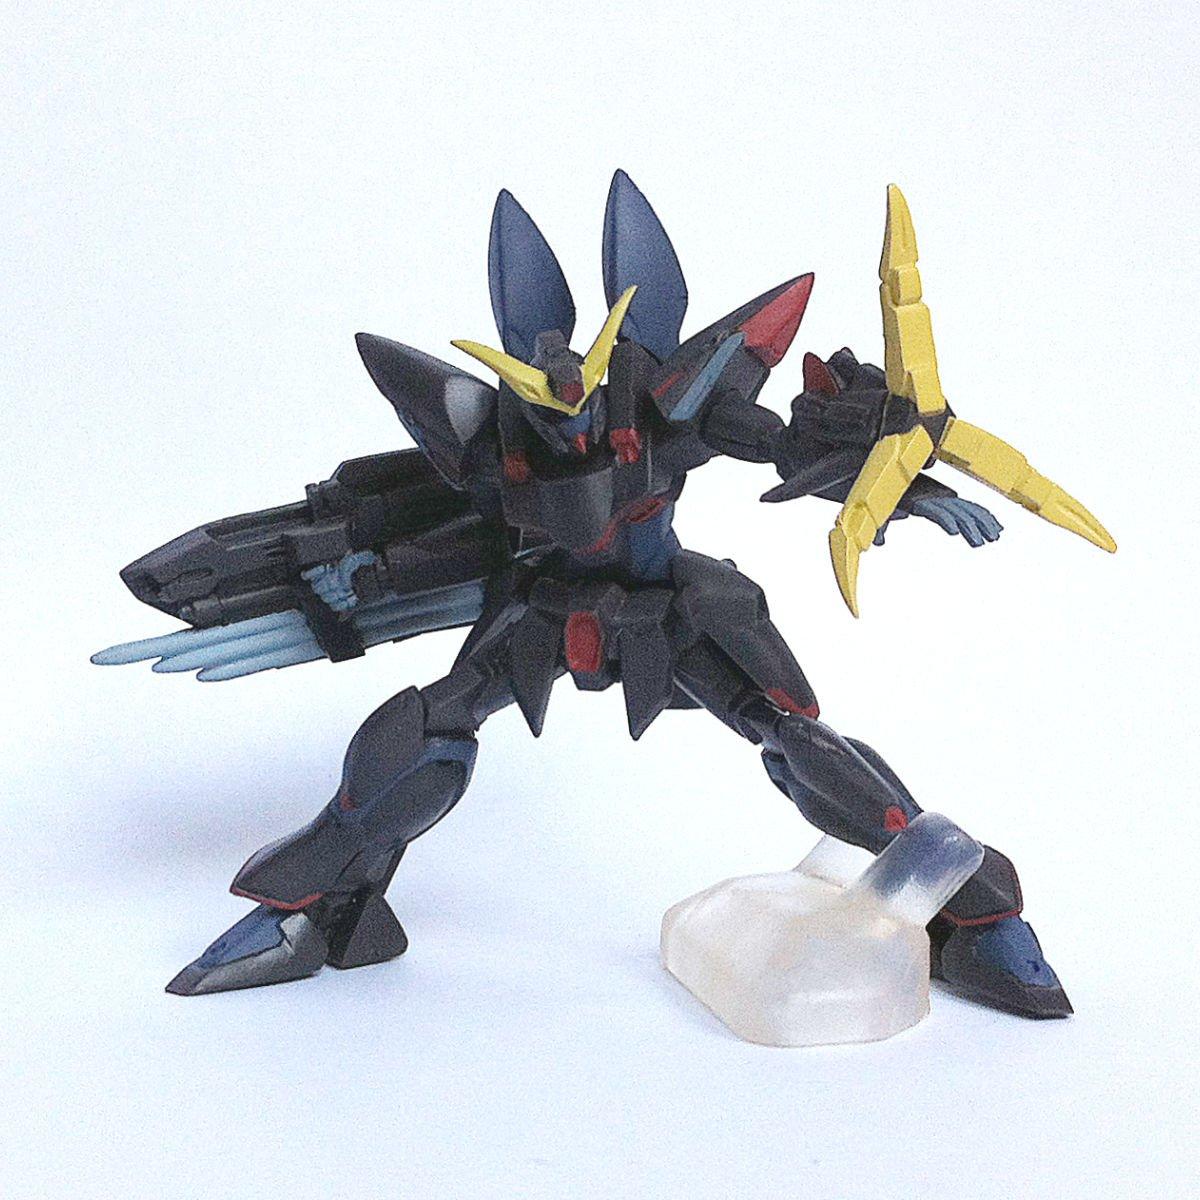 GAT-X207 Blitz Gundam from HG Gundam MS Selection by Bandai